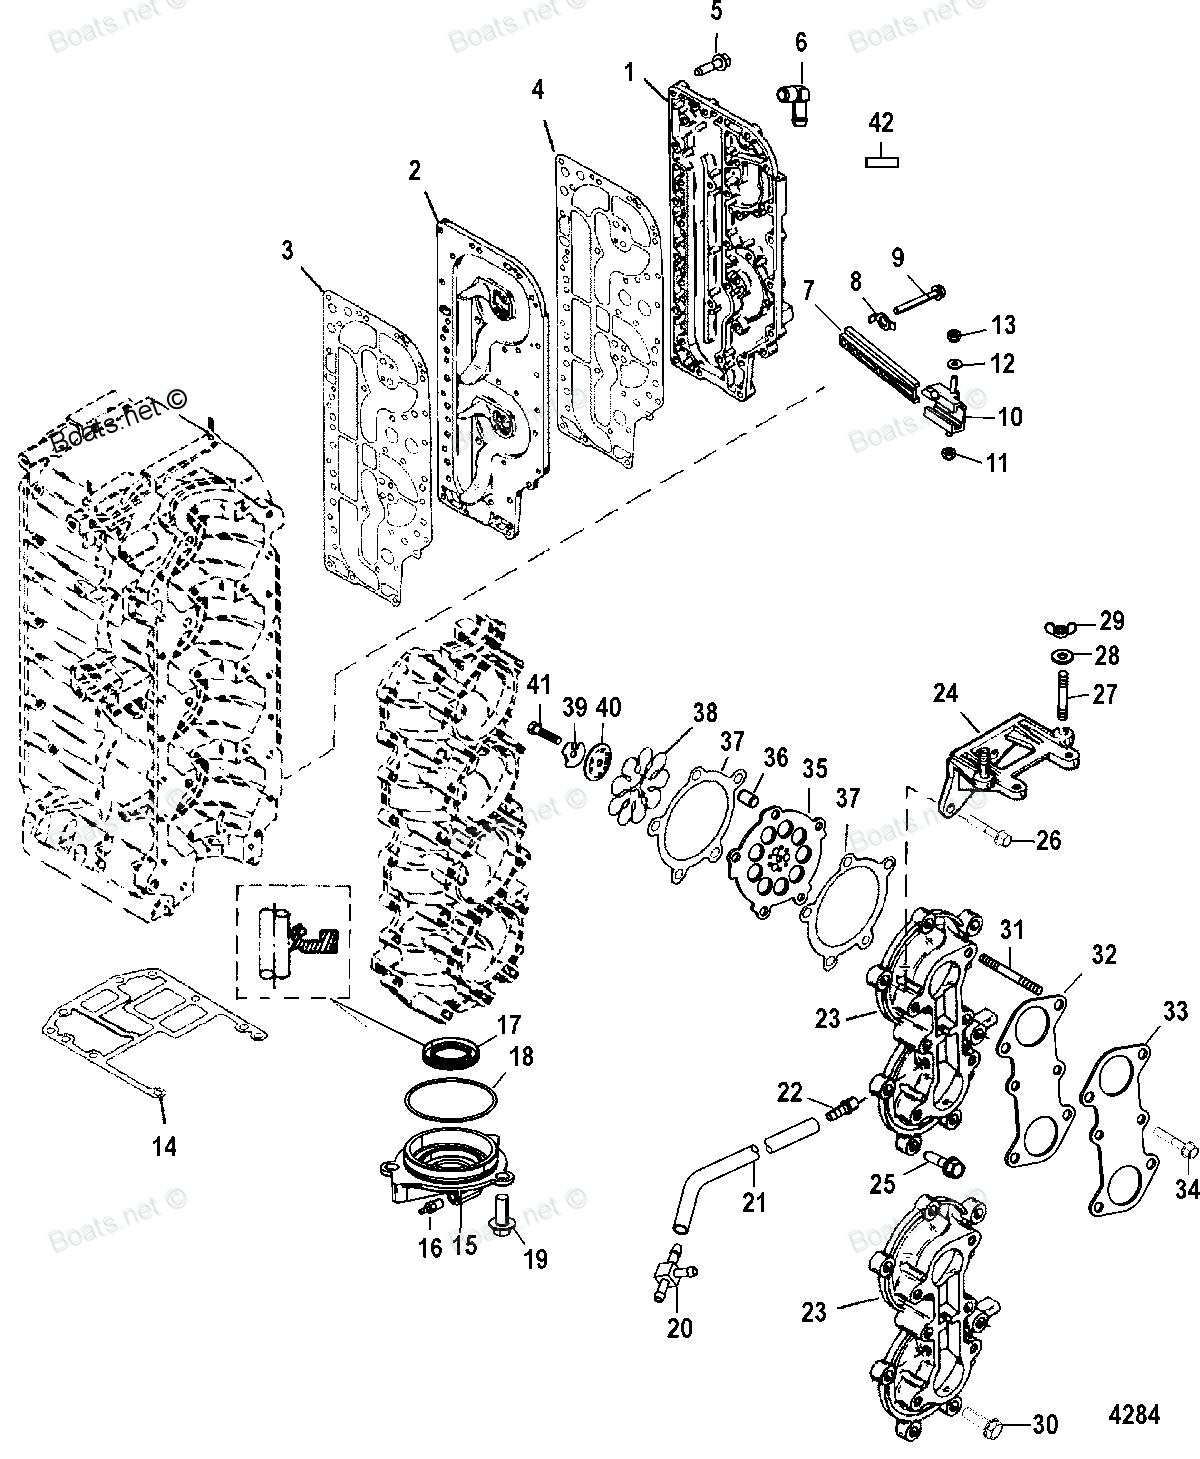 Grafik 4g63 Engine Diagram Html Full Version Hd Quality Diagram Html